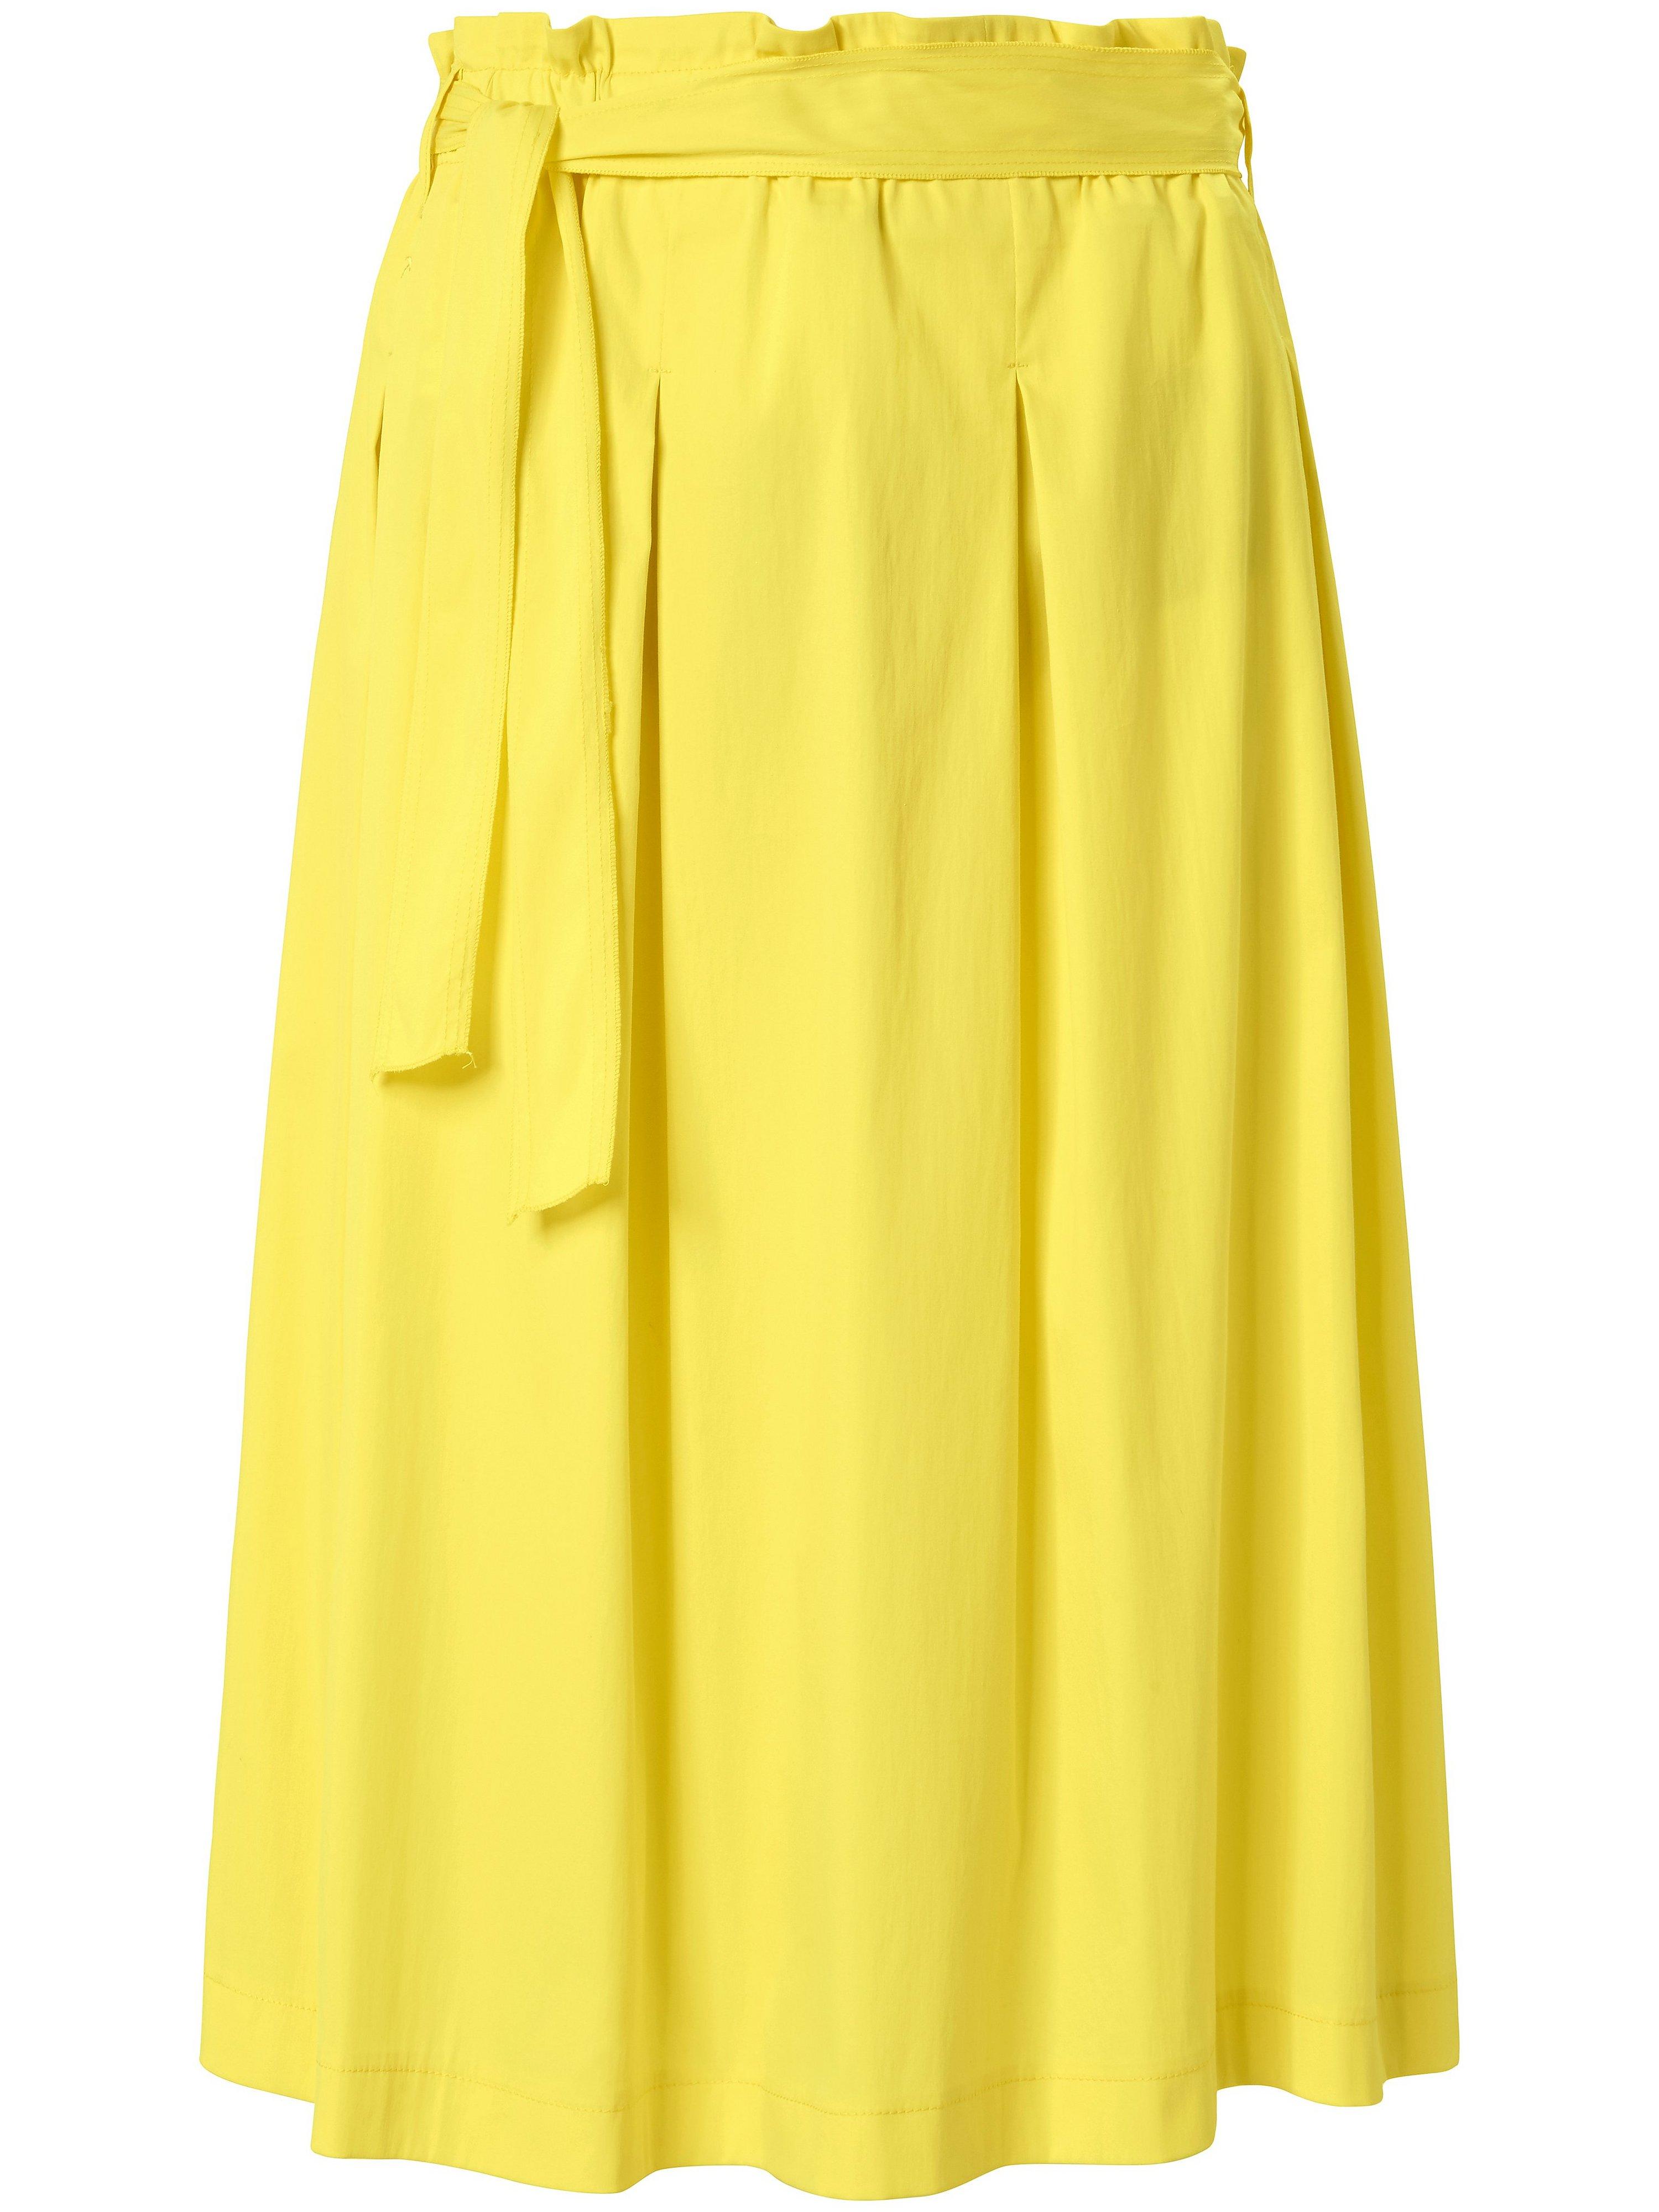 Skirt design Klara Brax Feel Good yellow